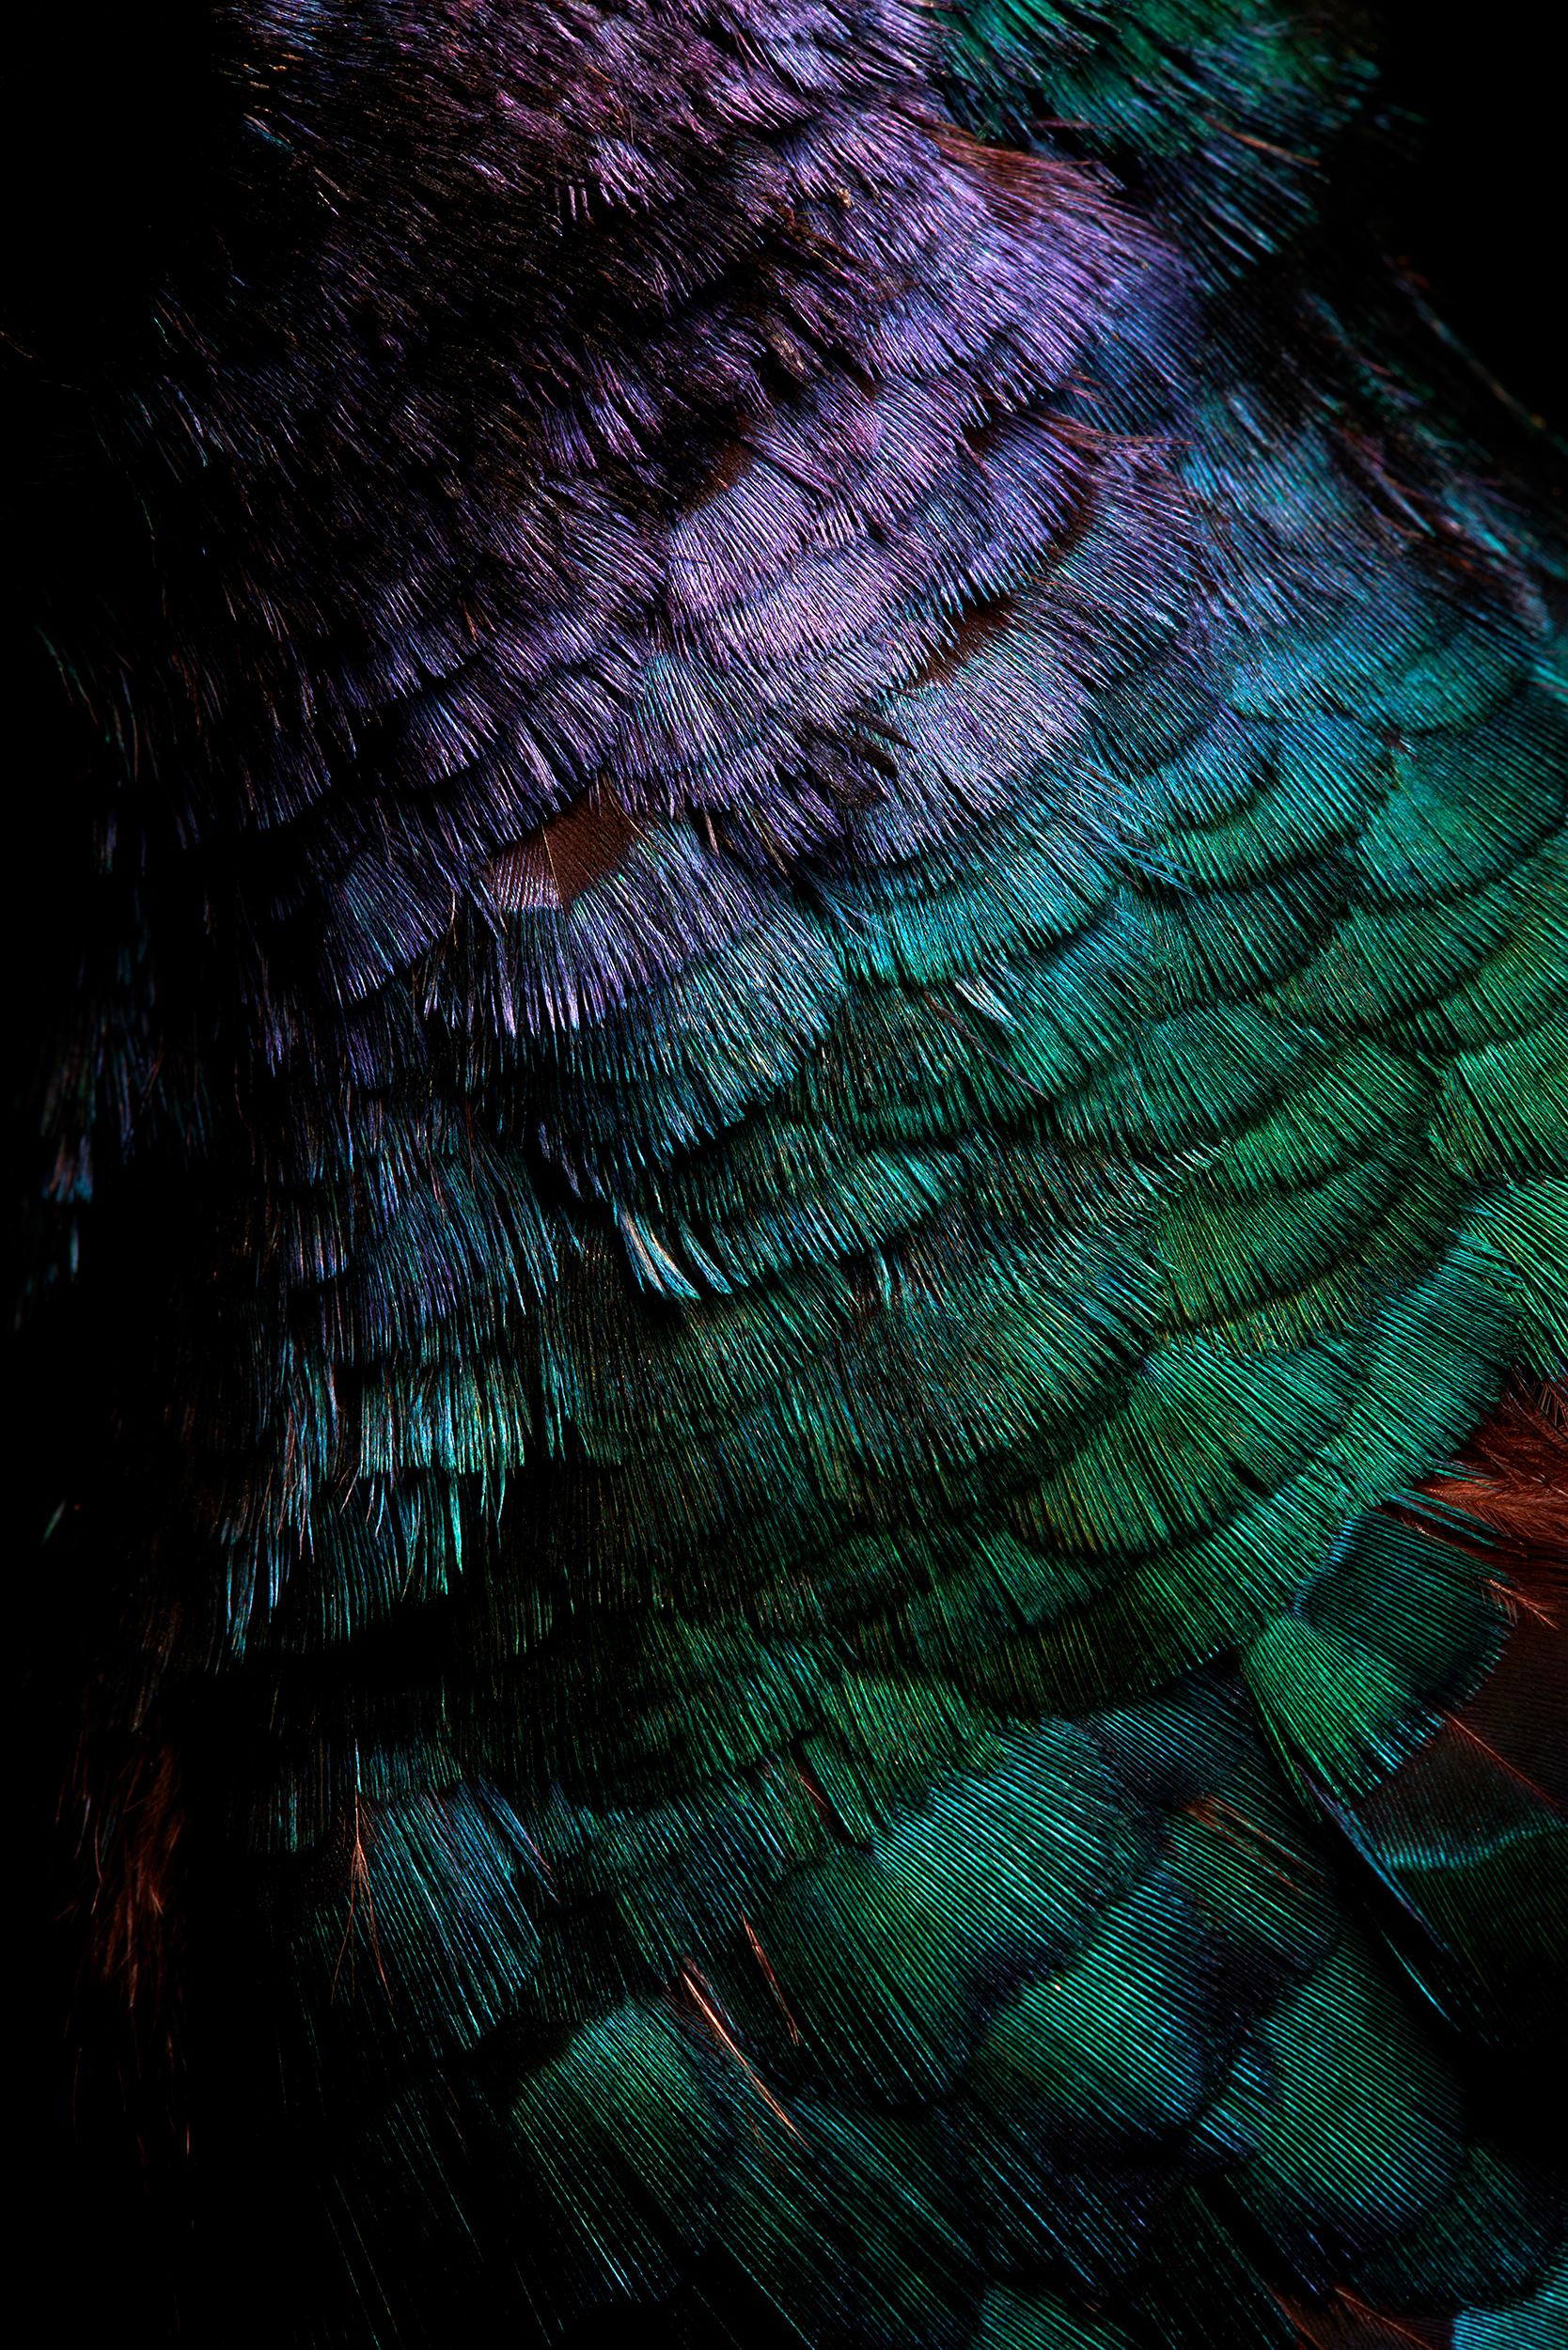 "<a href=""//mrsteel.london/shop/melanistic-pheasant-iii/"">REVEAL DETAILS / BUY</a>"